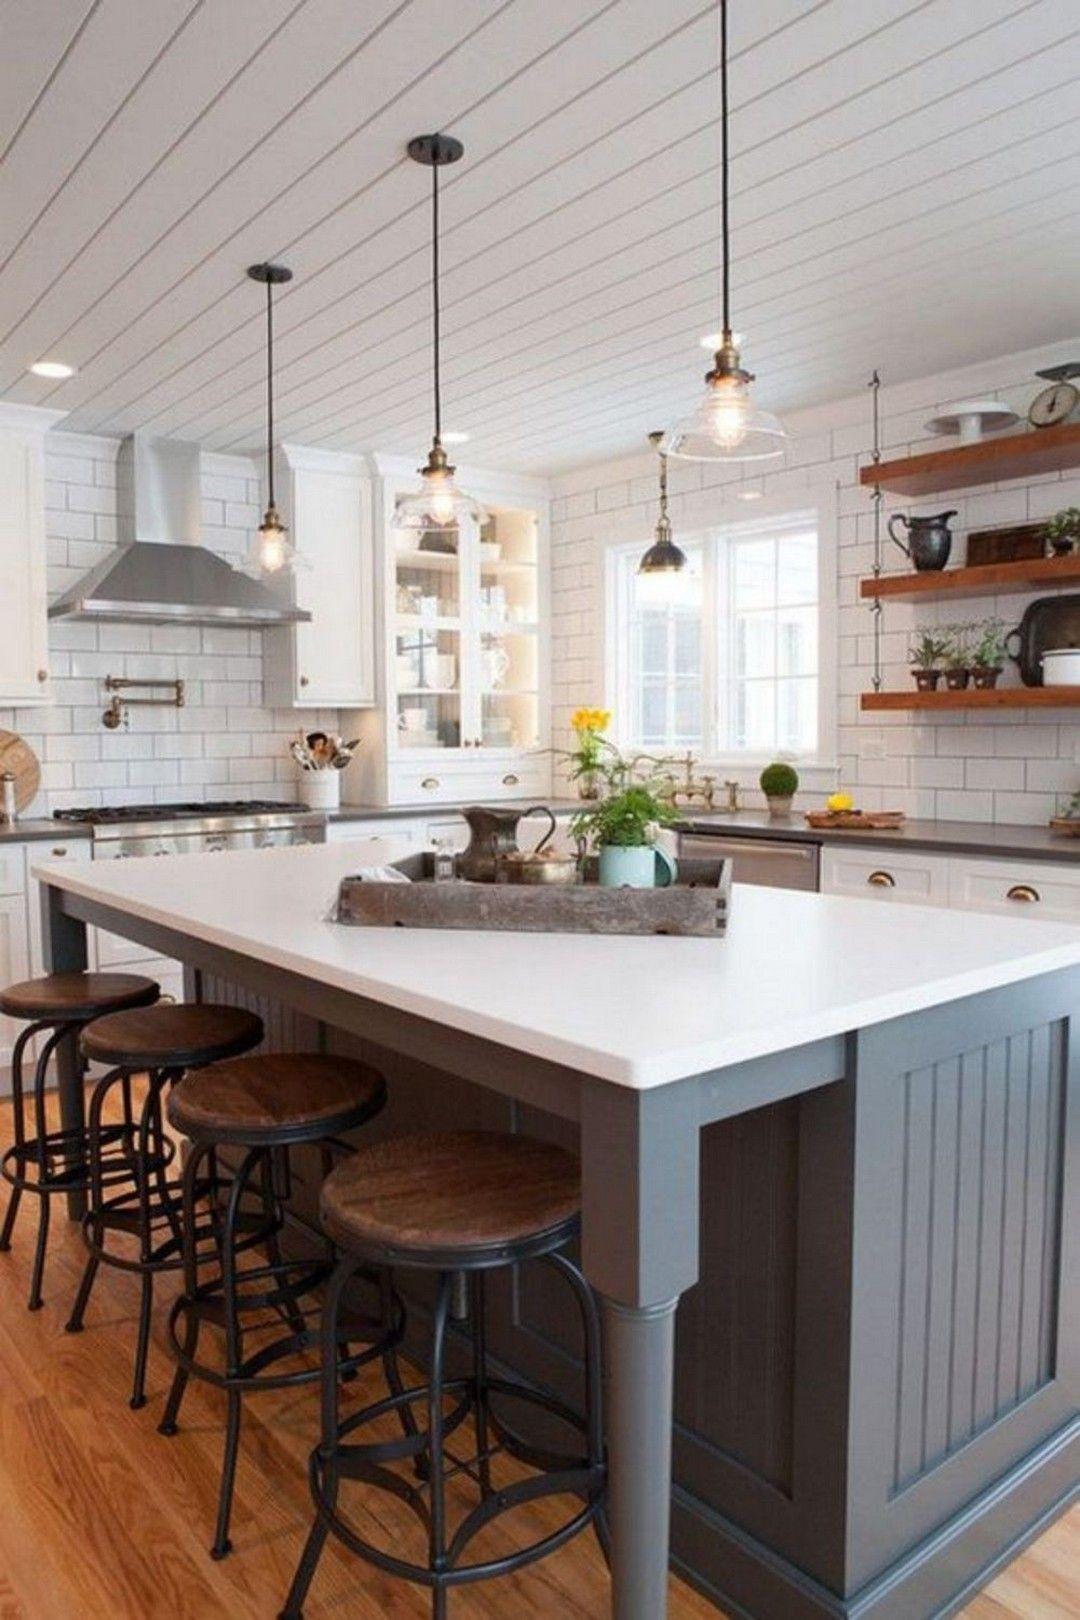 Pin By Cc On Lake Cabin Ideas Farmhouse Kitchen Cabinets Kitchen